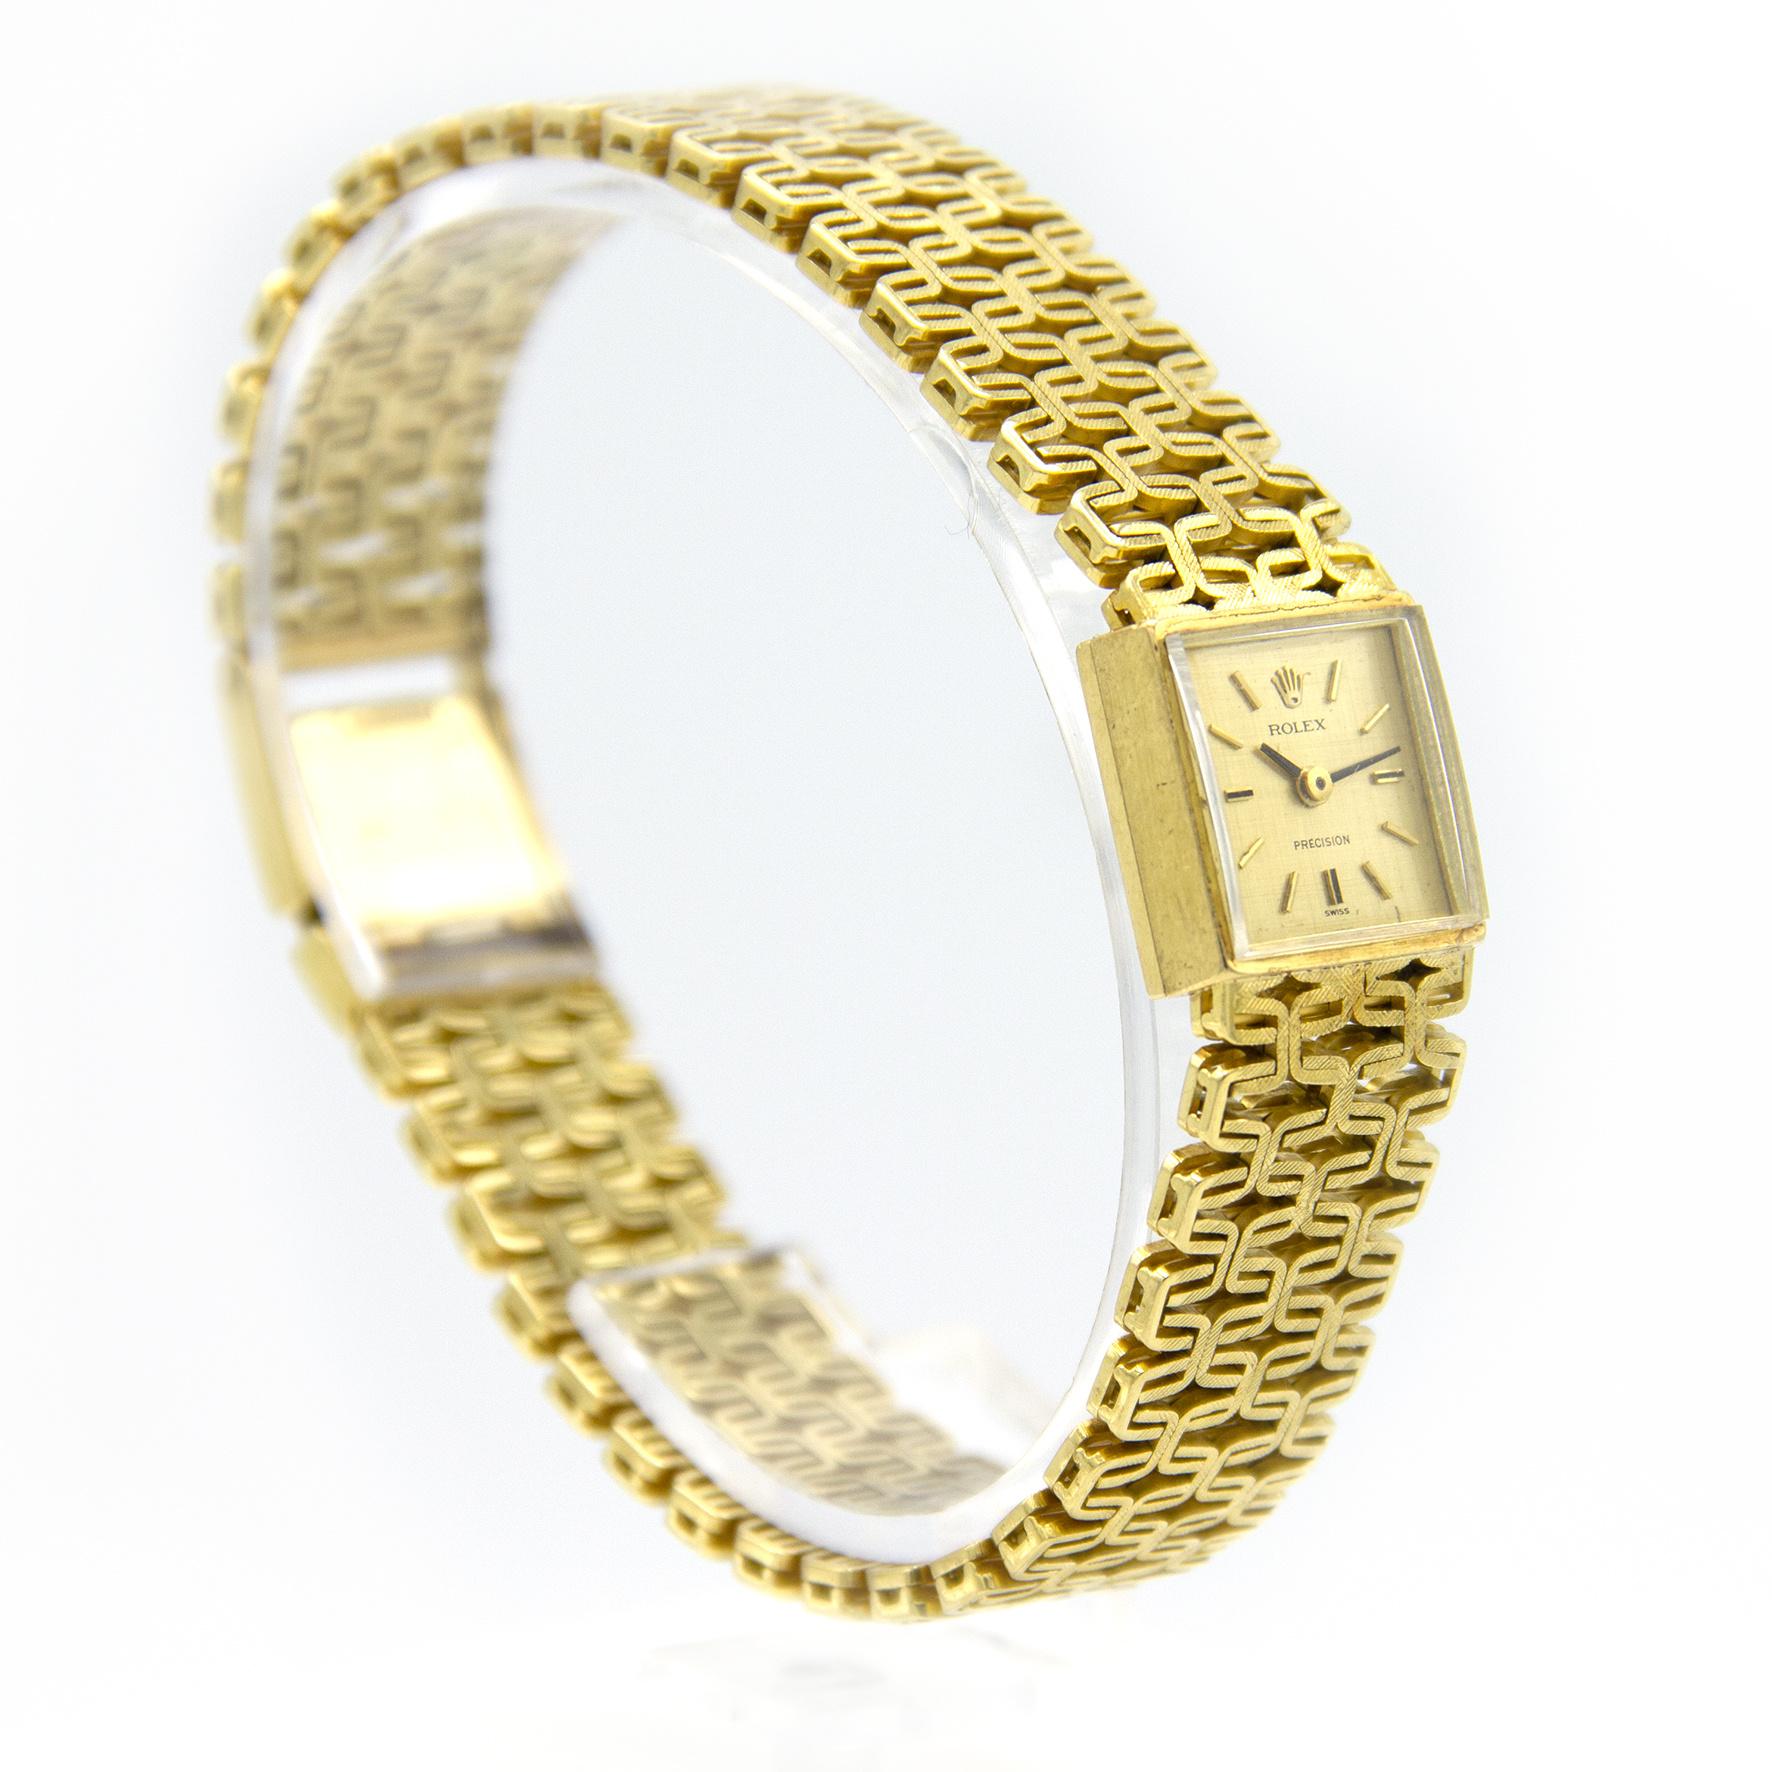 Rolex Precision -  Dames Horloge - 18 karaat geelgoud-5